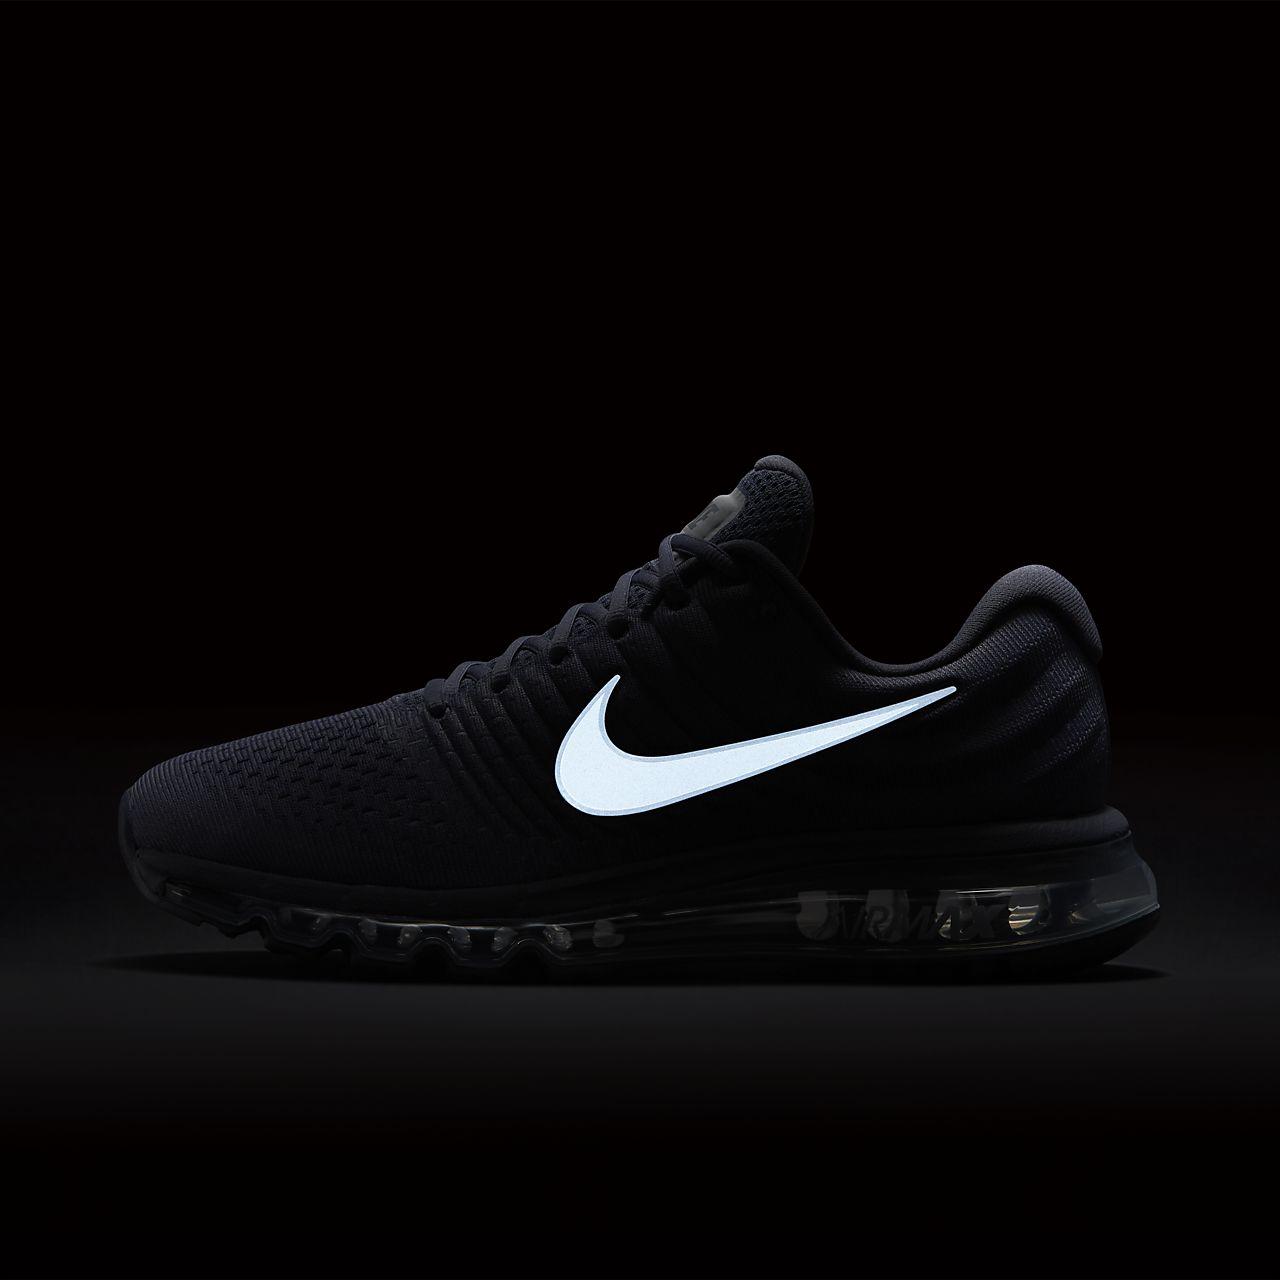 Aq8628 Running Nike 001 Max 2017 Air Light Da Carbonwolf Scarpa Se Grey 4cjLR35Aq